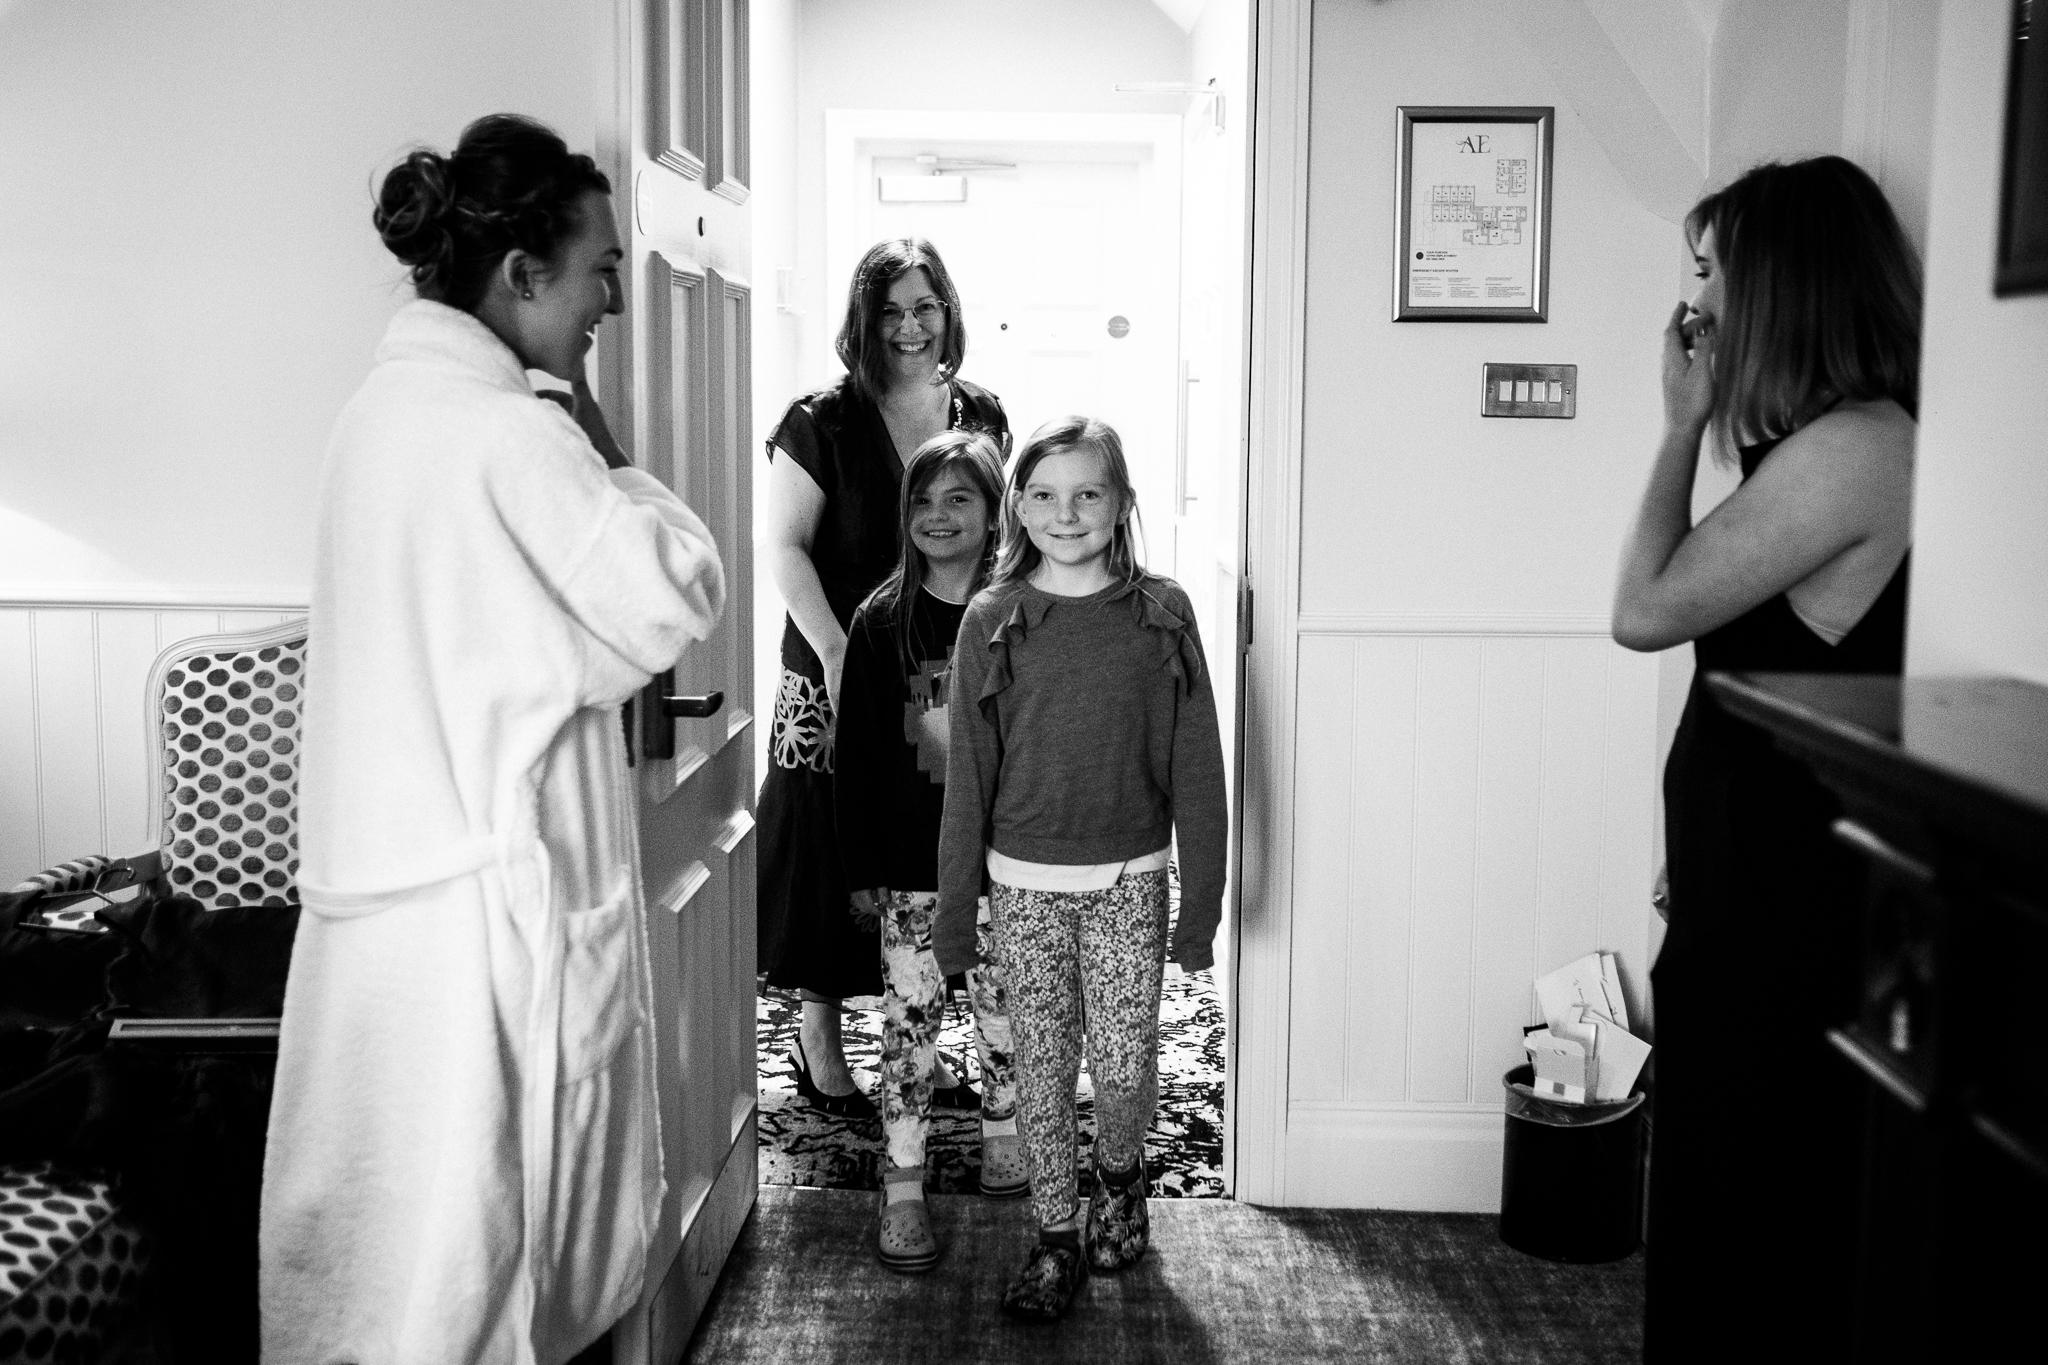 Relaxed Documentary Wedding Photography at The Wizard Inn, Alderley Edge Cheshire - Jenny Harper-2.jpg